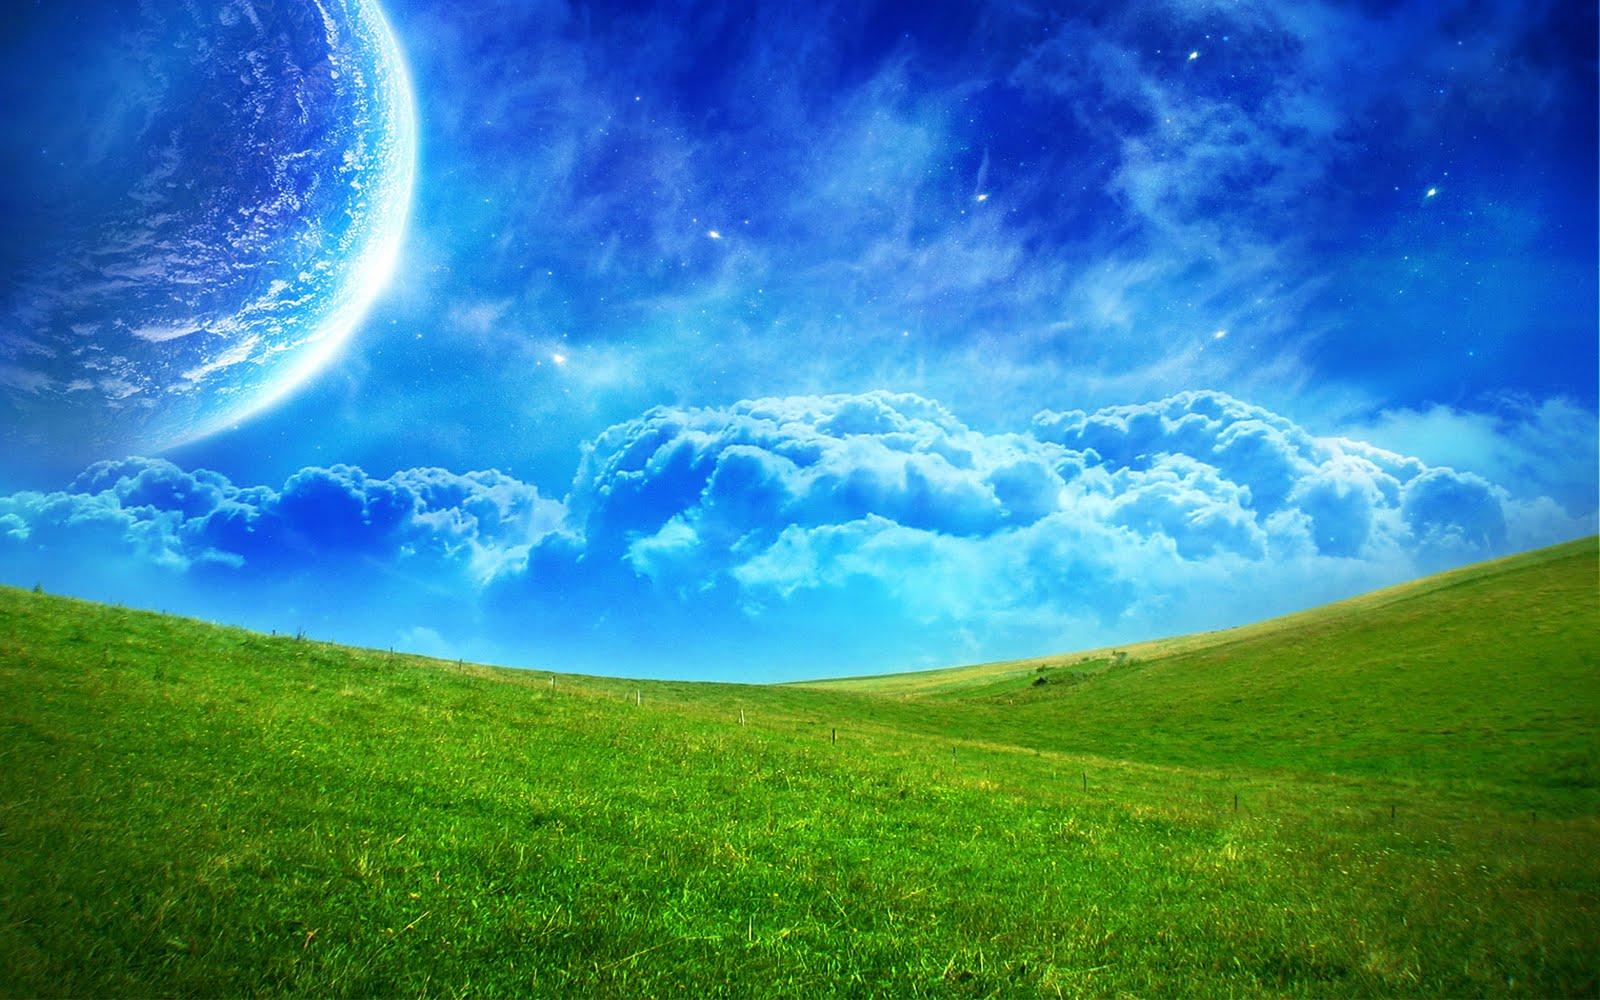 Cool HD Nature Desktop Wallpapers: Beautiful Landscape Wallpapers